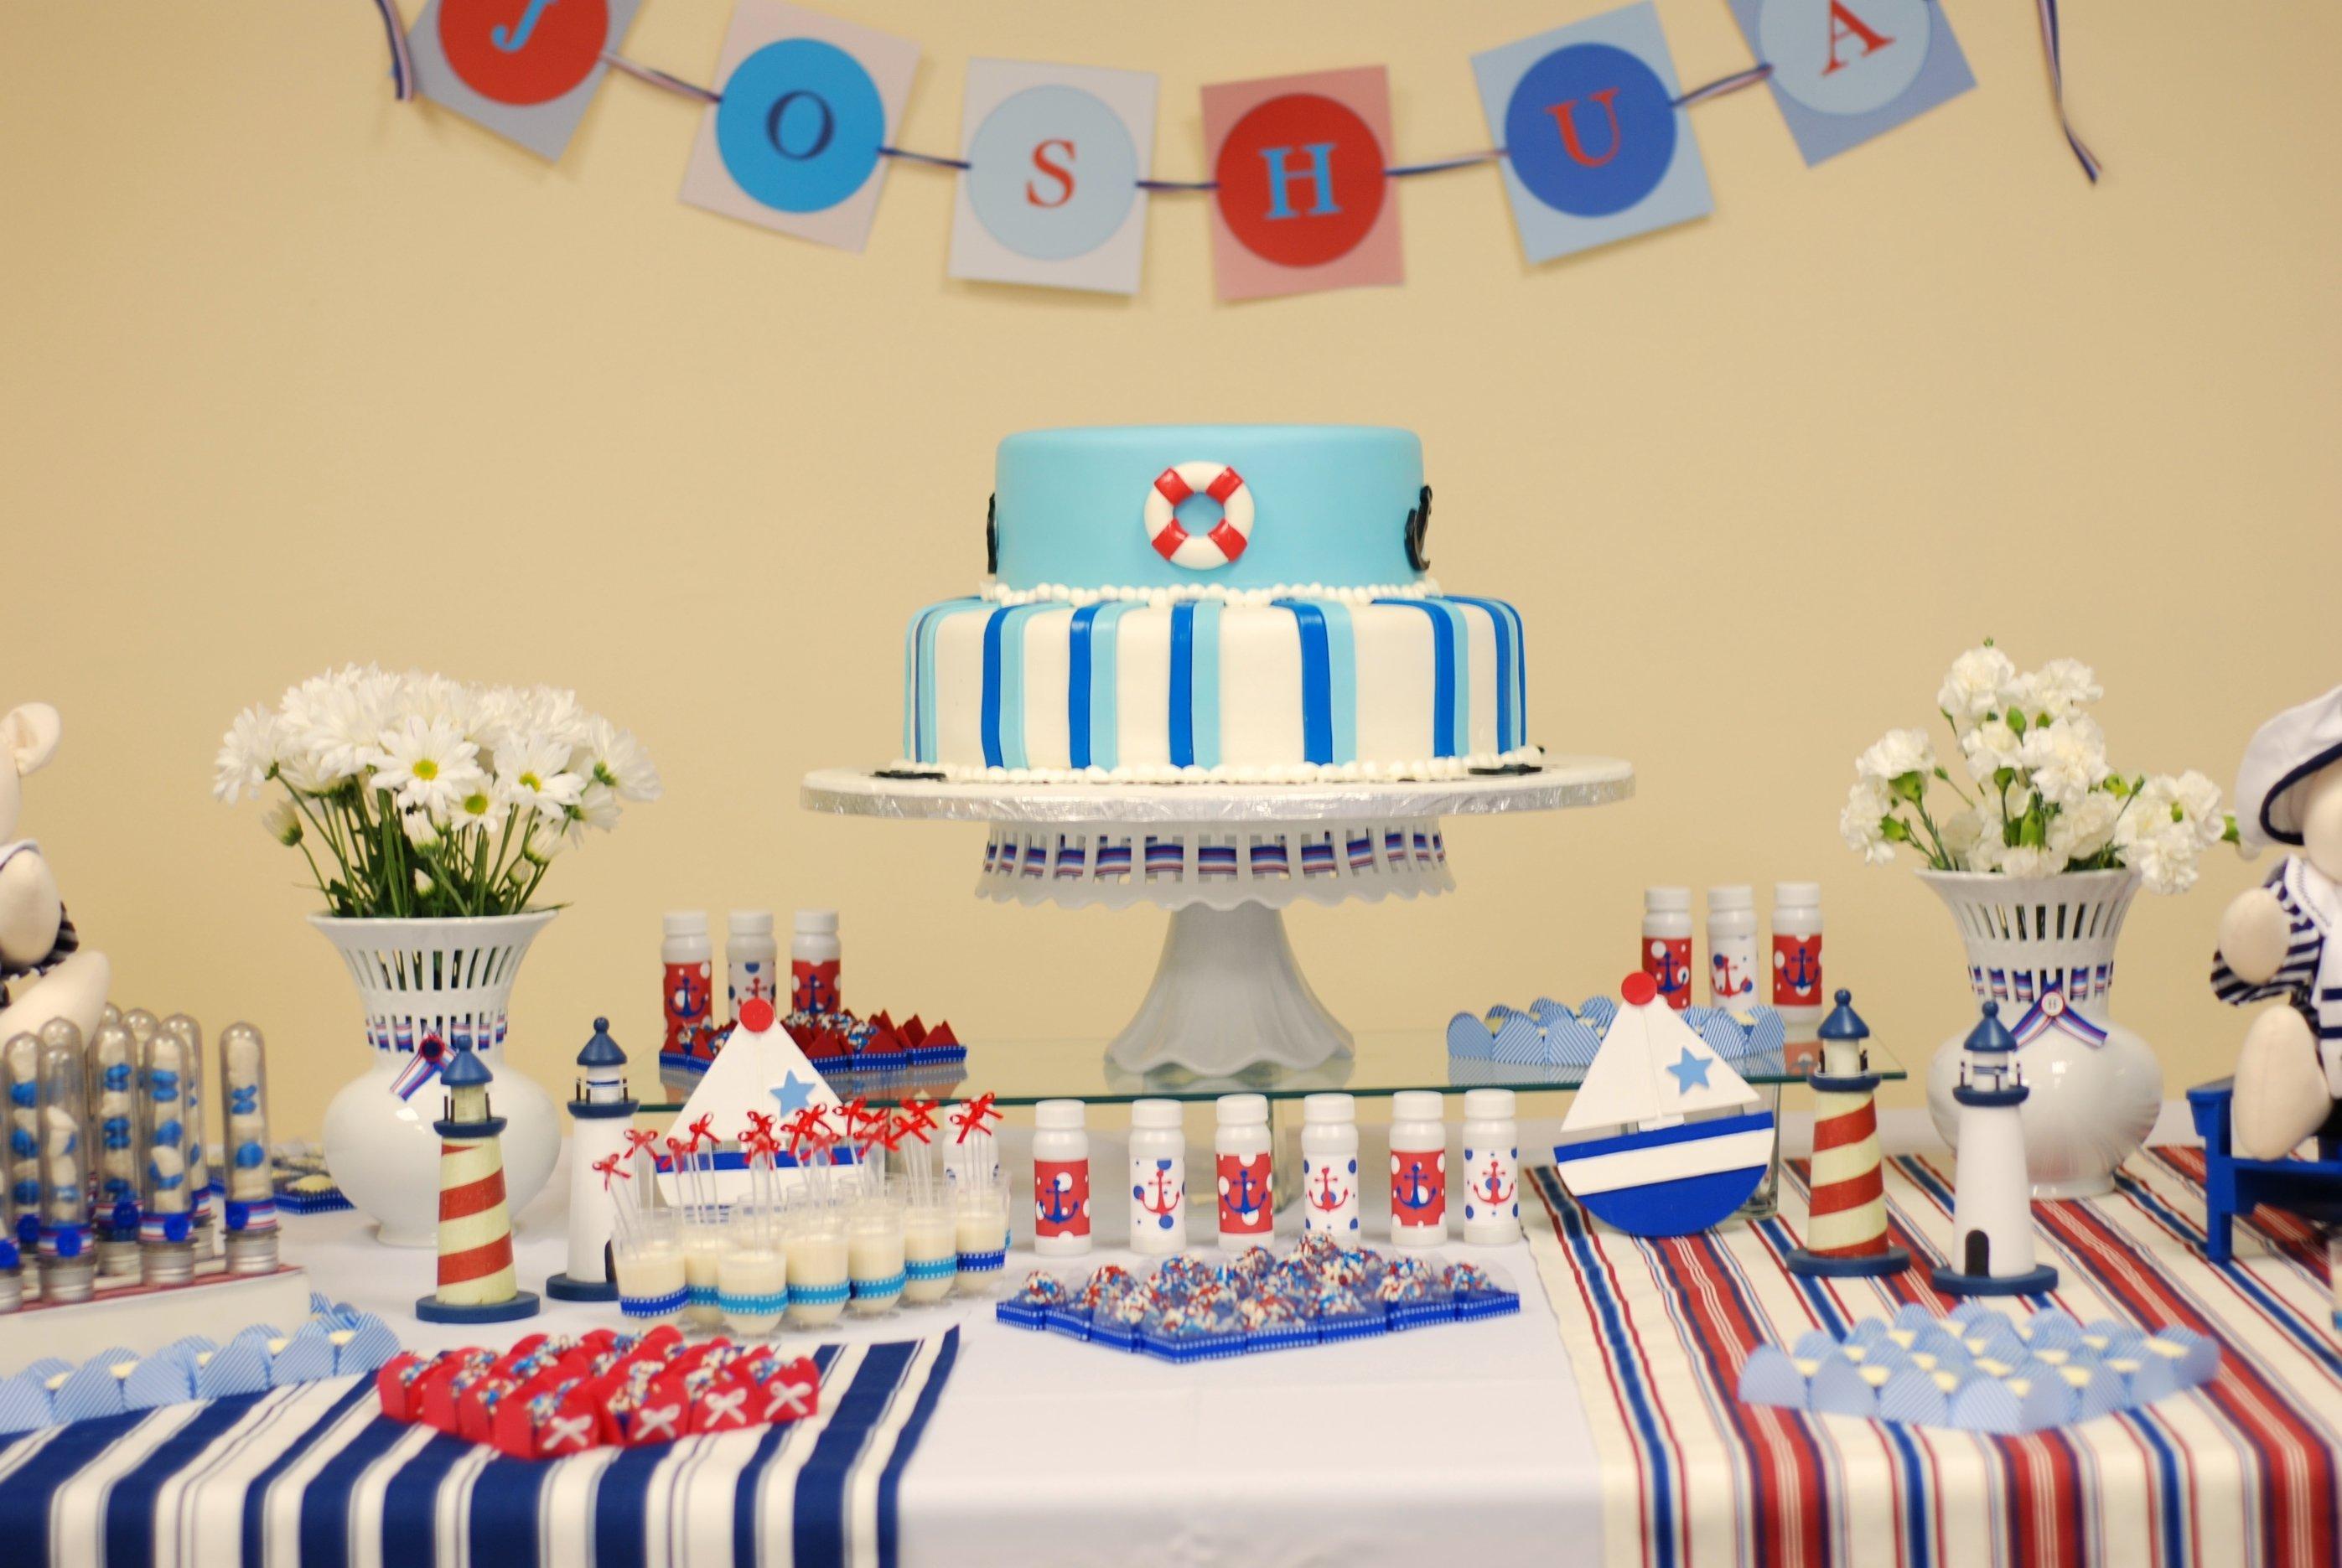 10 Stunning 1St Birthday Party Ideas For Boys boys birthday party decoration ideas decorideaz decorideaz 10 2020